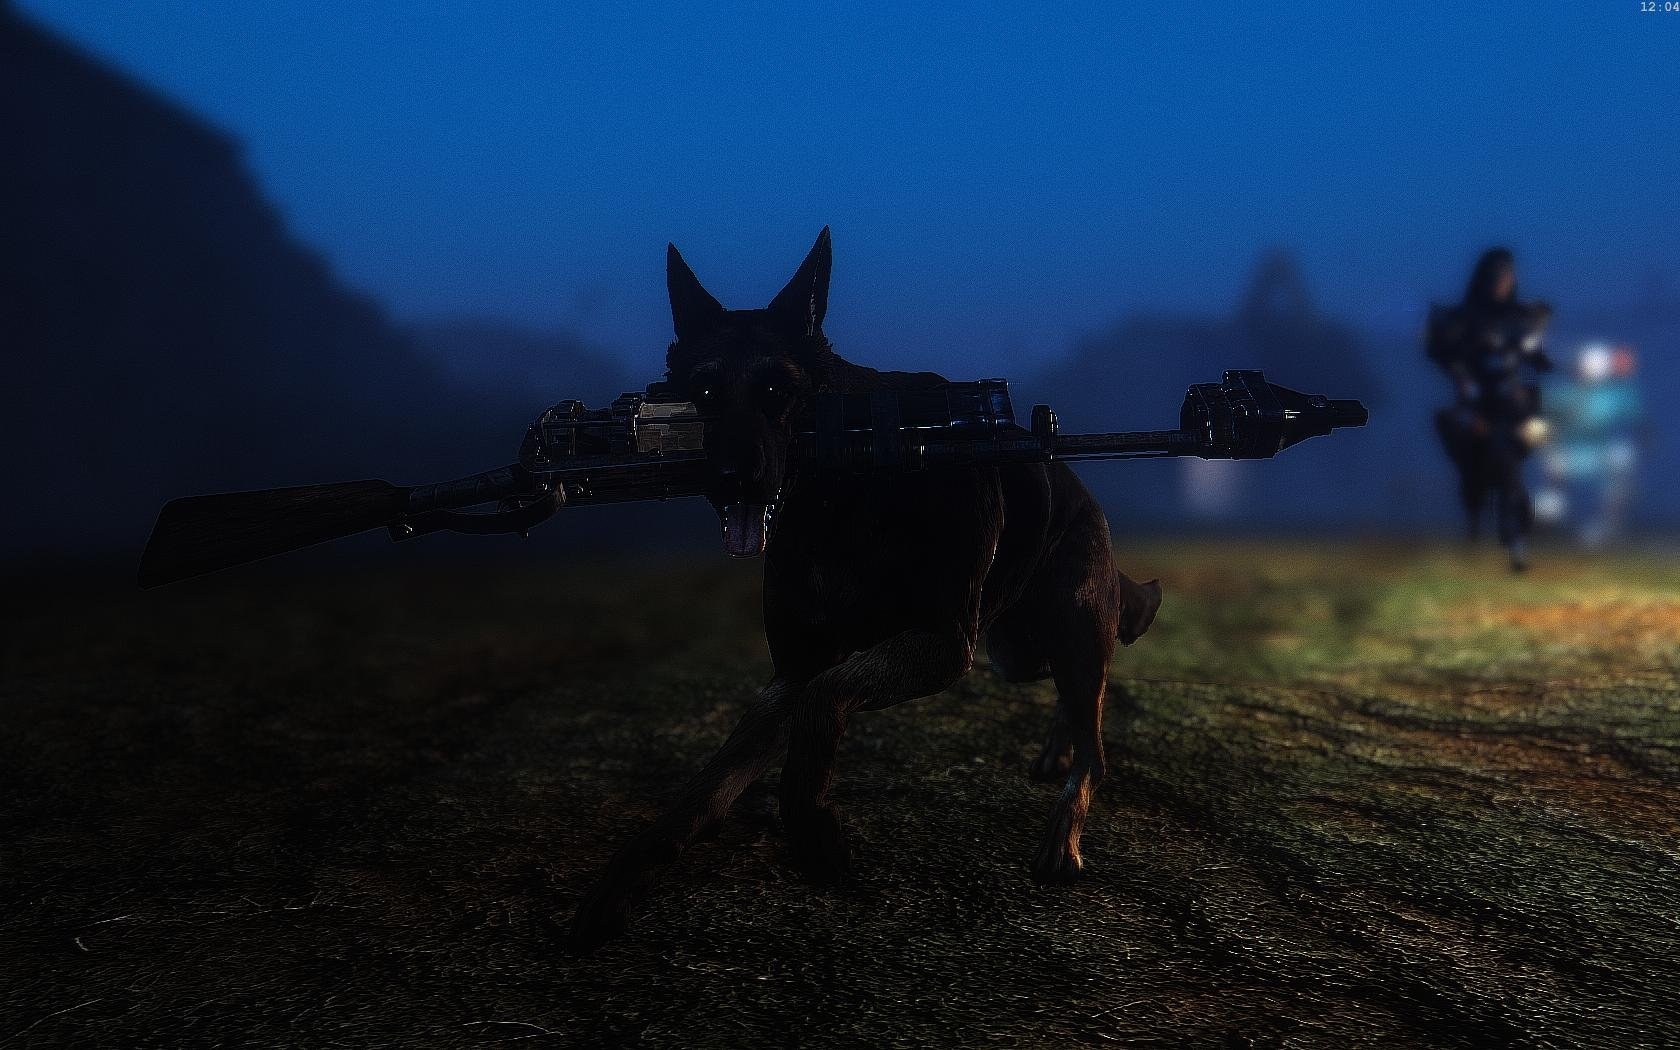 Fallout4 2018-10-24 12-04-02-88.jpg